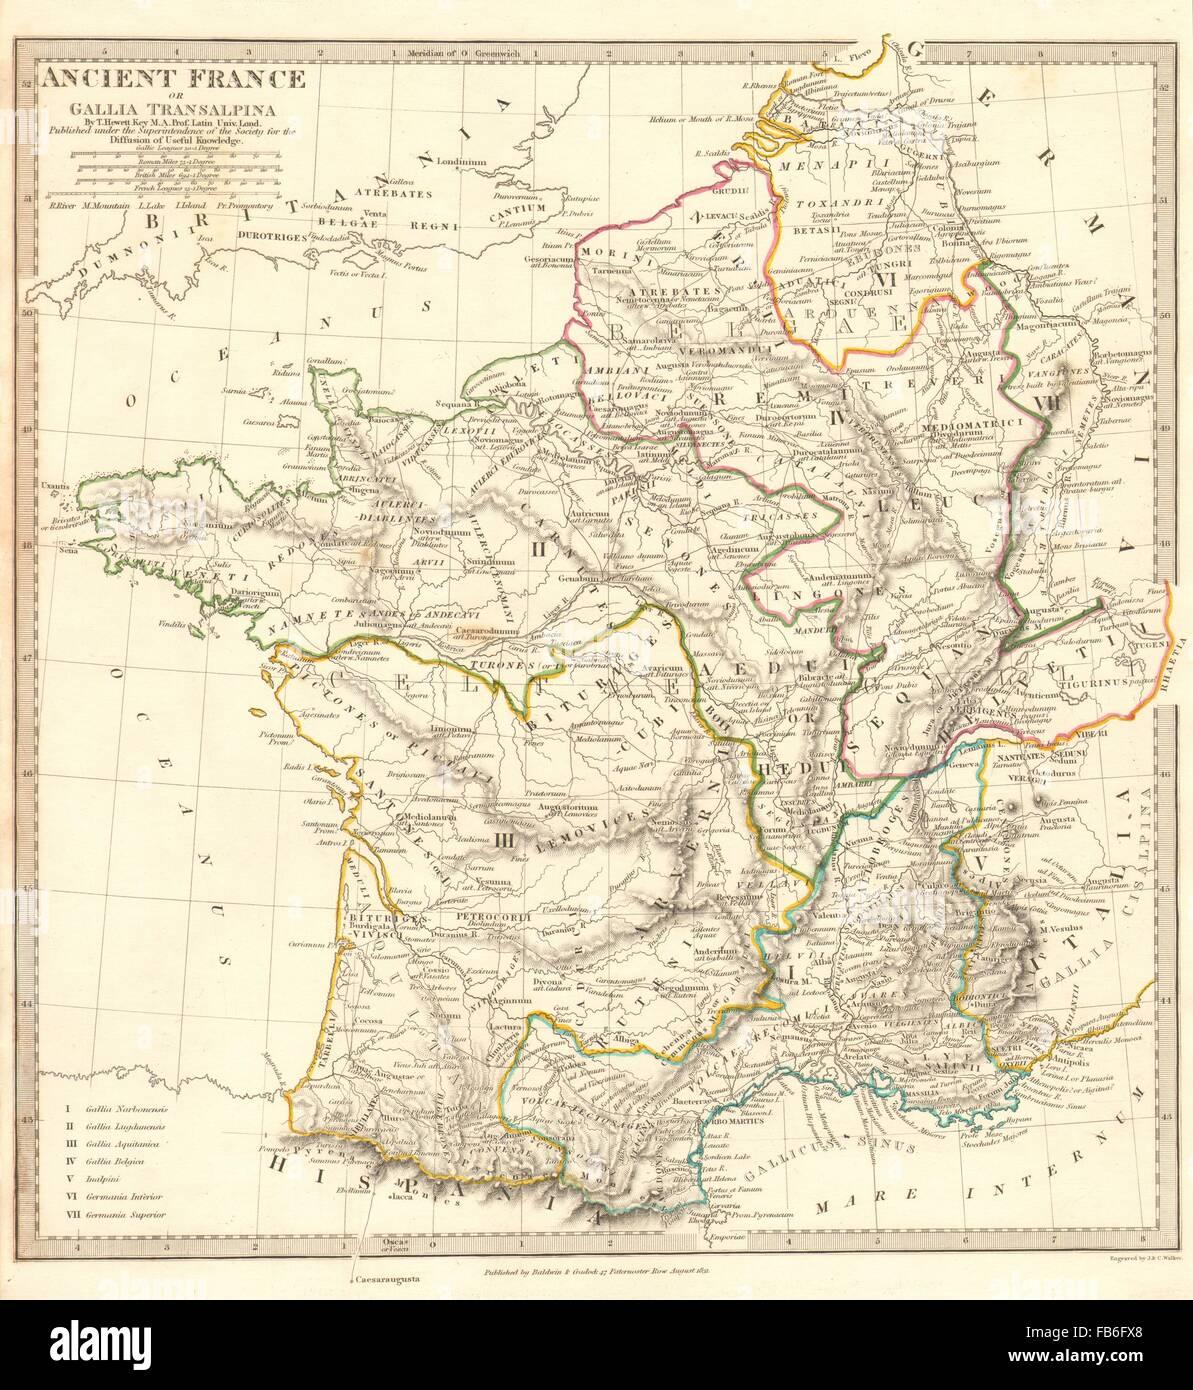 ANCIENT ROMAN FRANCE GAUL: Gallia Transalpina. Roman names ... on julius caesar, dacia map, roman republic, hadrian's wall map, roman legion, numidia on a map, iberian peninsula map, thrace map, england map, sparta map, ancient rome, visigoths map, macedonia map, mark antony, battle of alesia, spain map, huns map, cisalpine gaul, hispania map, iberian peninsula, gallic empire, byzantine empire map, alexandria map, sicily map, gallic wars, greece map, carolingian dynasty, zama map, pyrenees map, decline of the roman empire, constantinople map, athens map,